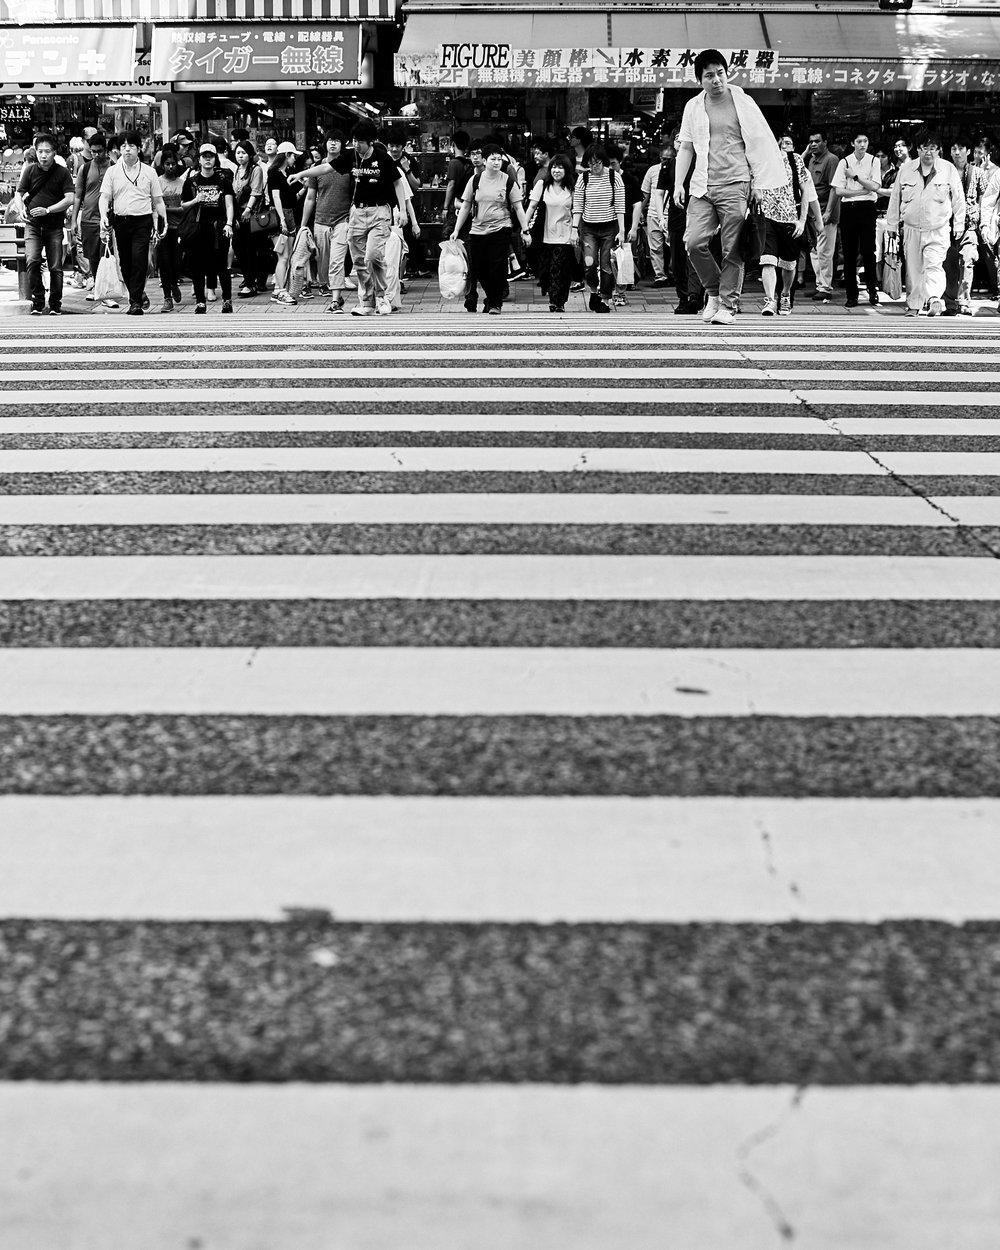 SnapPilots_17-07-06_Tokyo2017_bnw_87.jpg